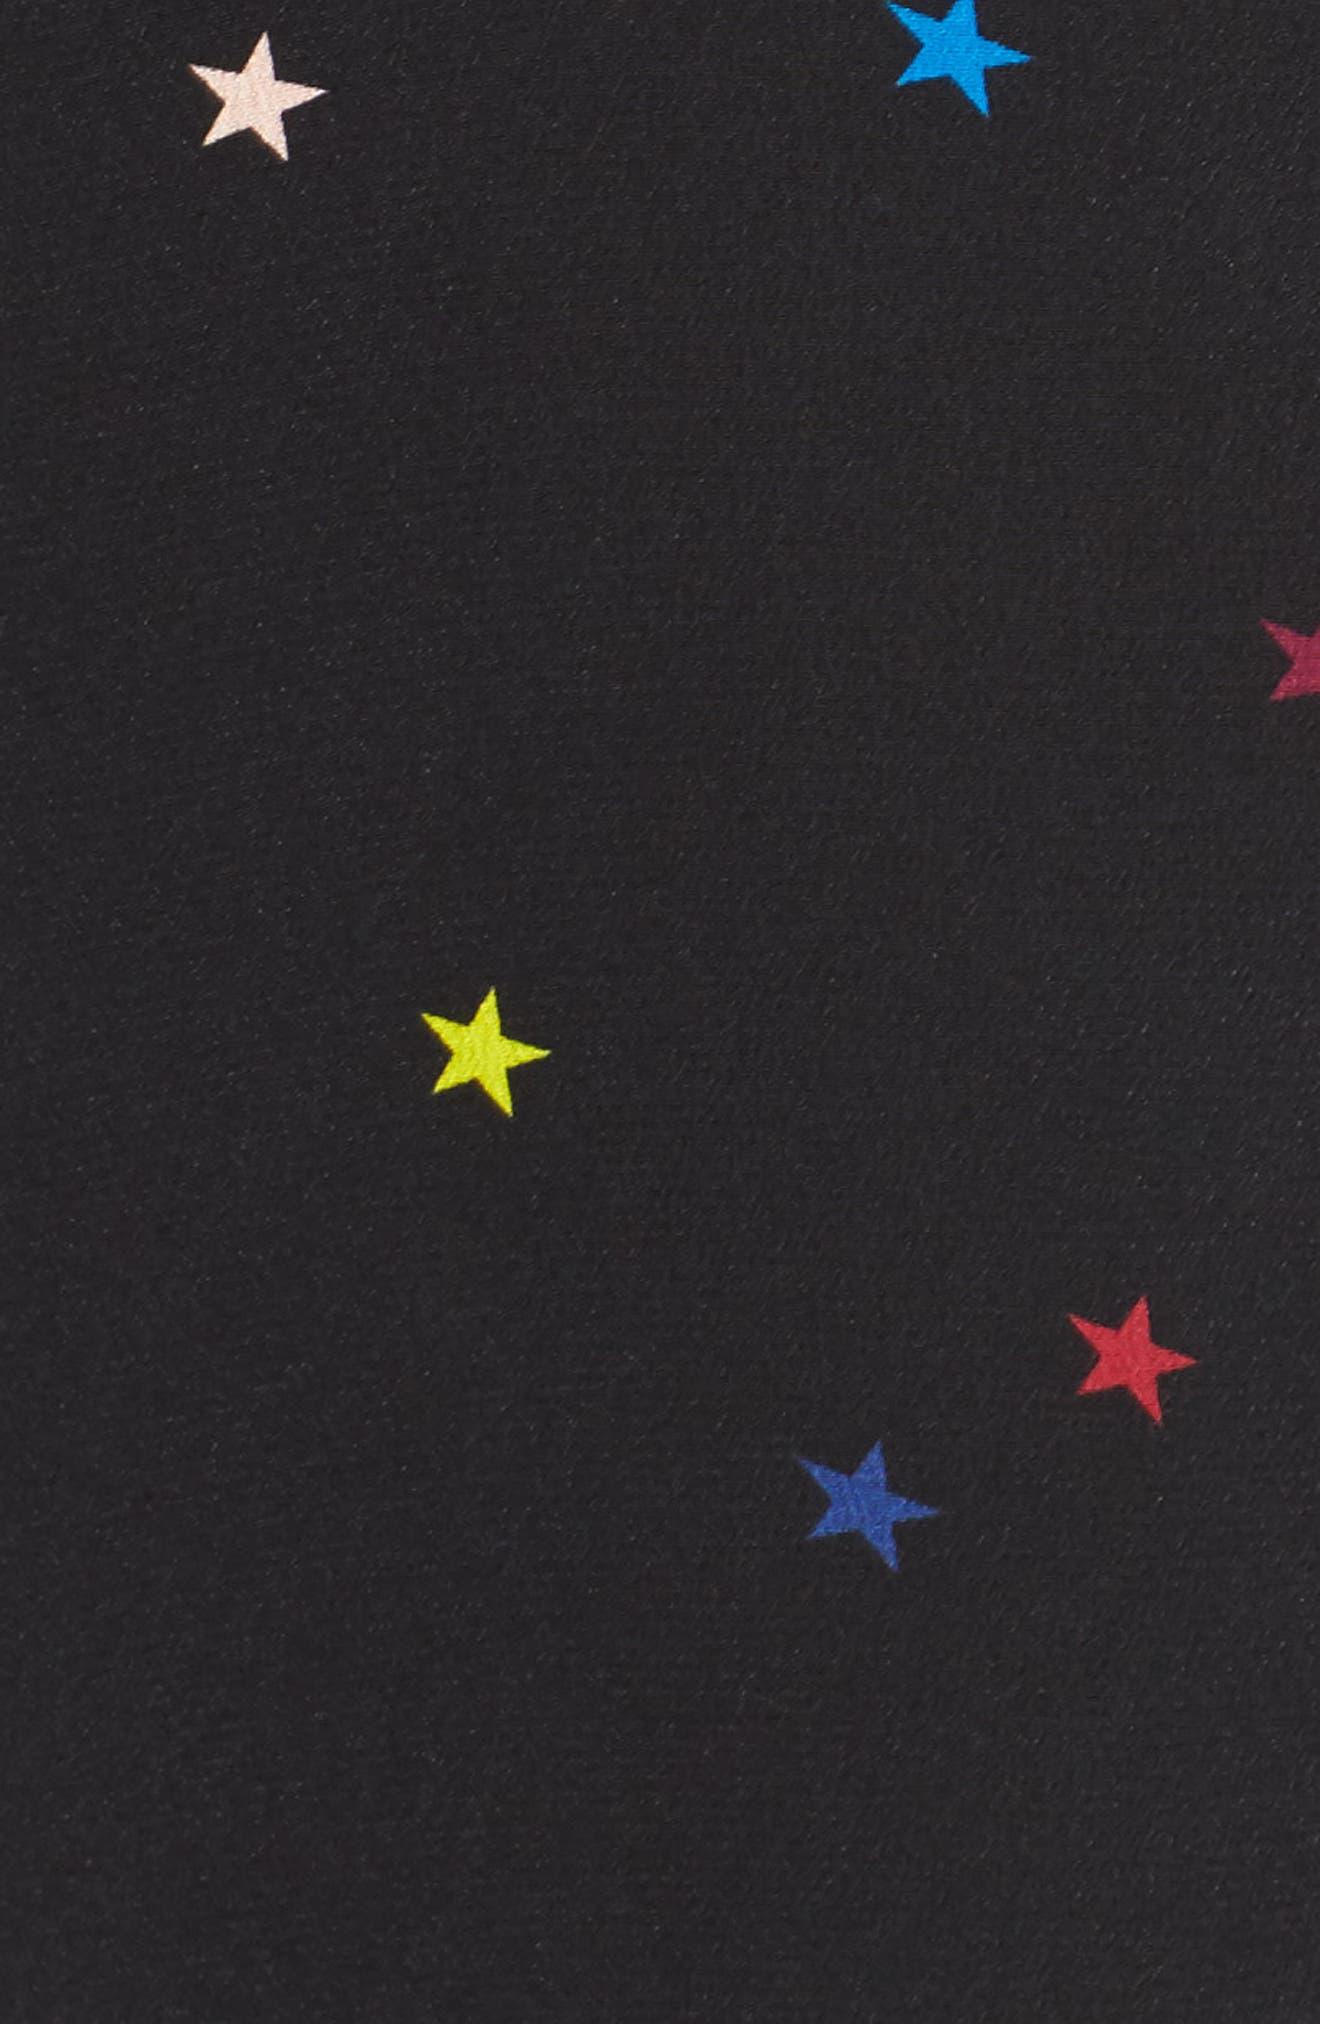 Kate Star Print Silk Blouse,                             Alternate thumbnail 5, color,                             Rainbow Stars/ Black